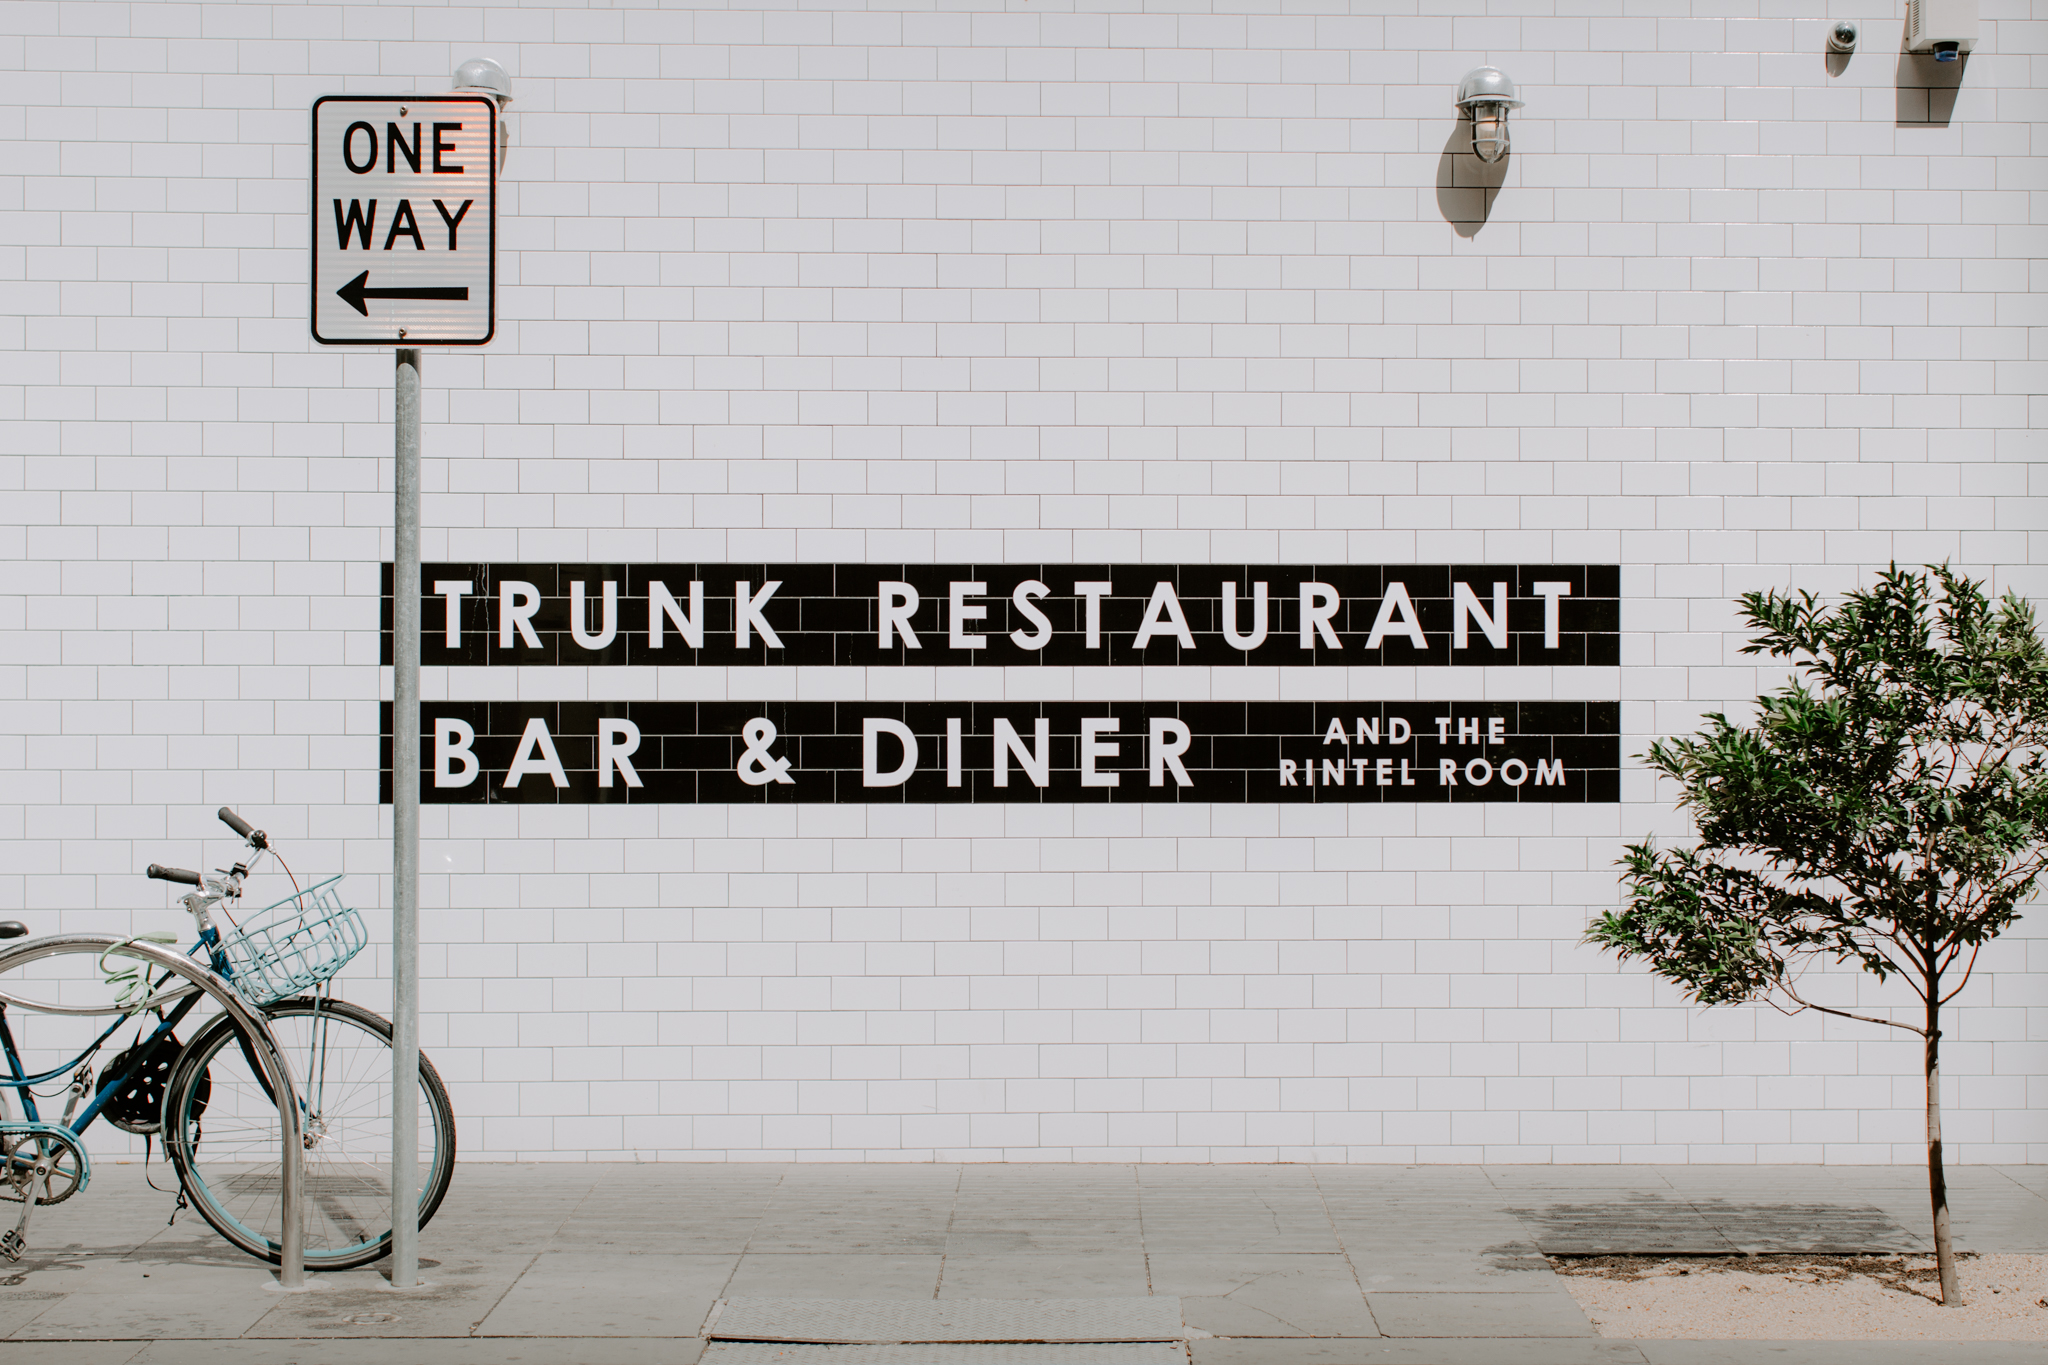 Trunk-restaurant-wedding-EmotionsandMath-001.jpg